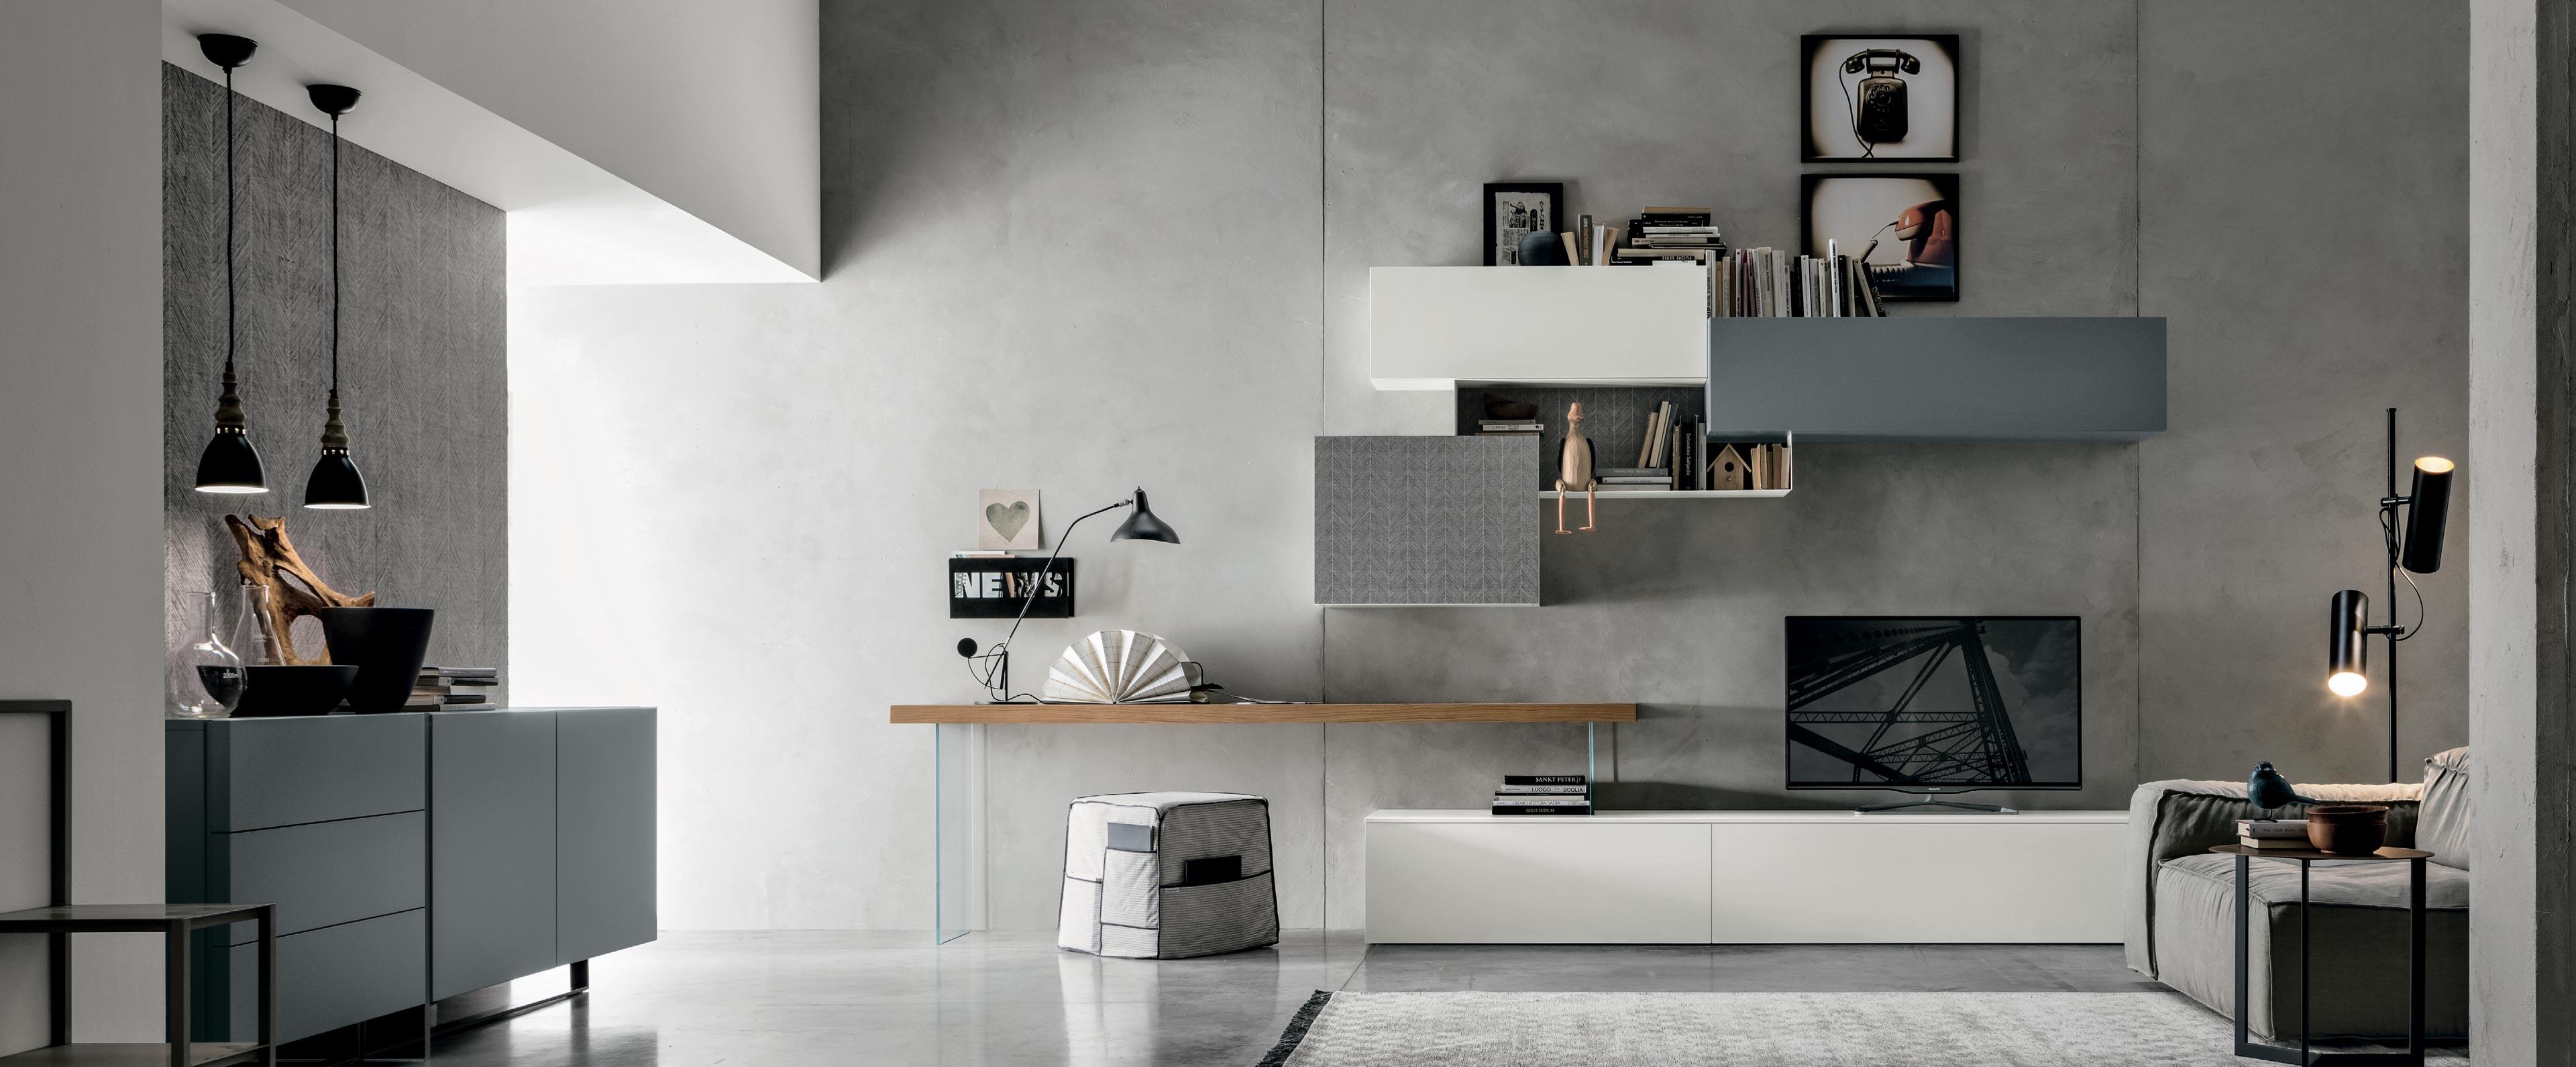 living-tomasella-mobili-incardone-enna